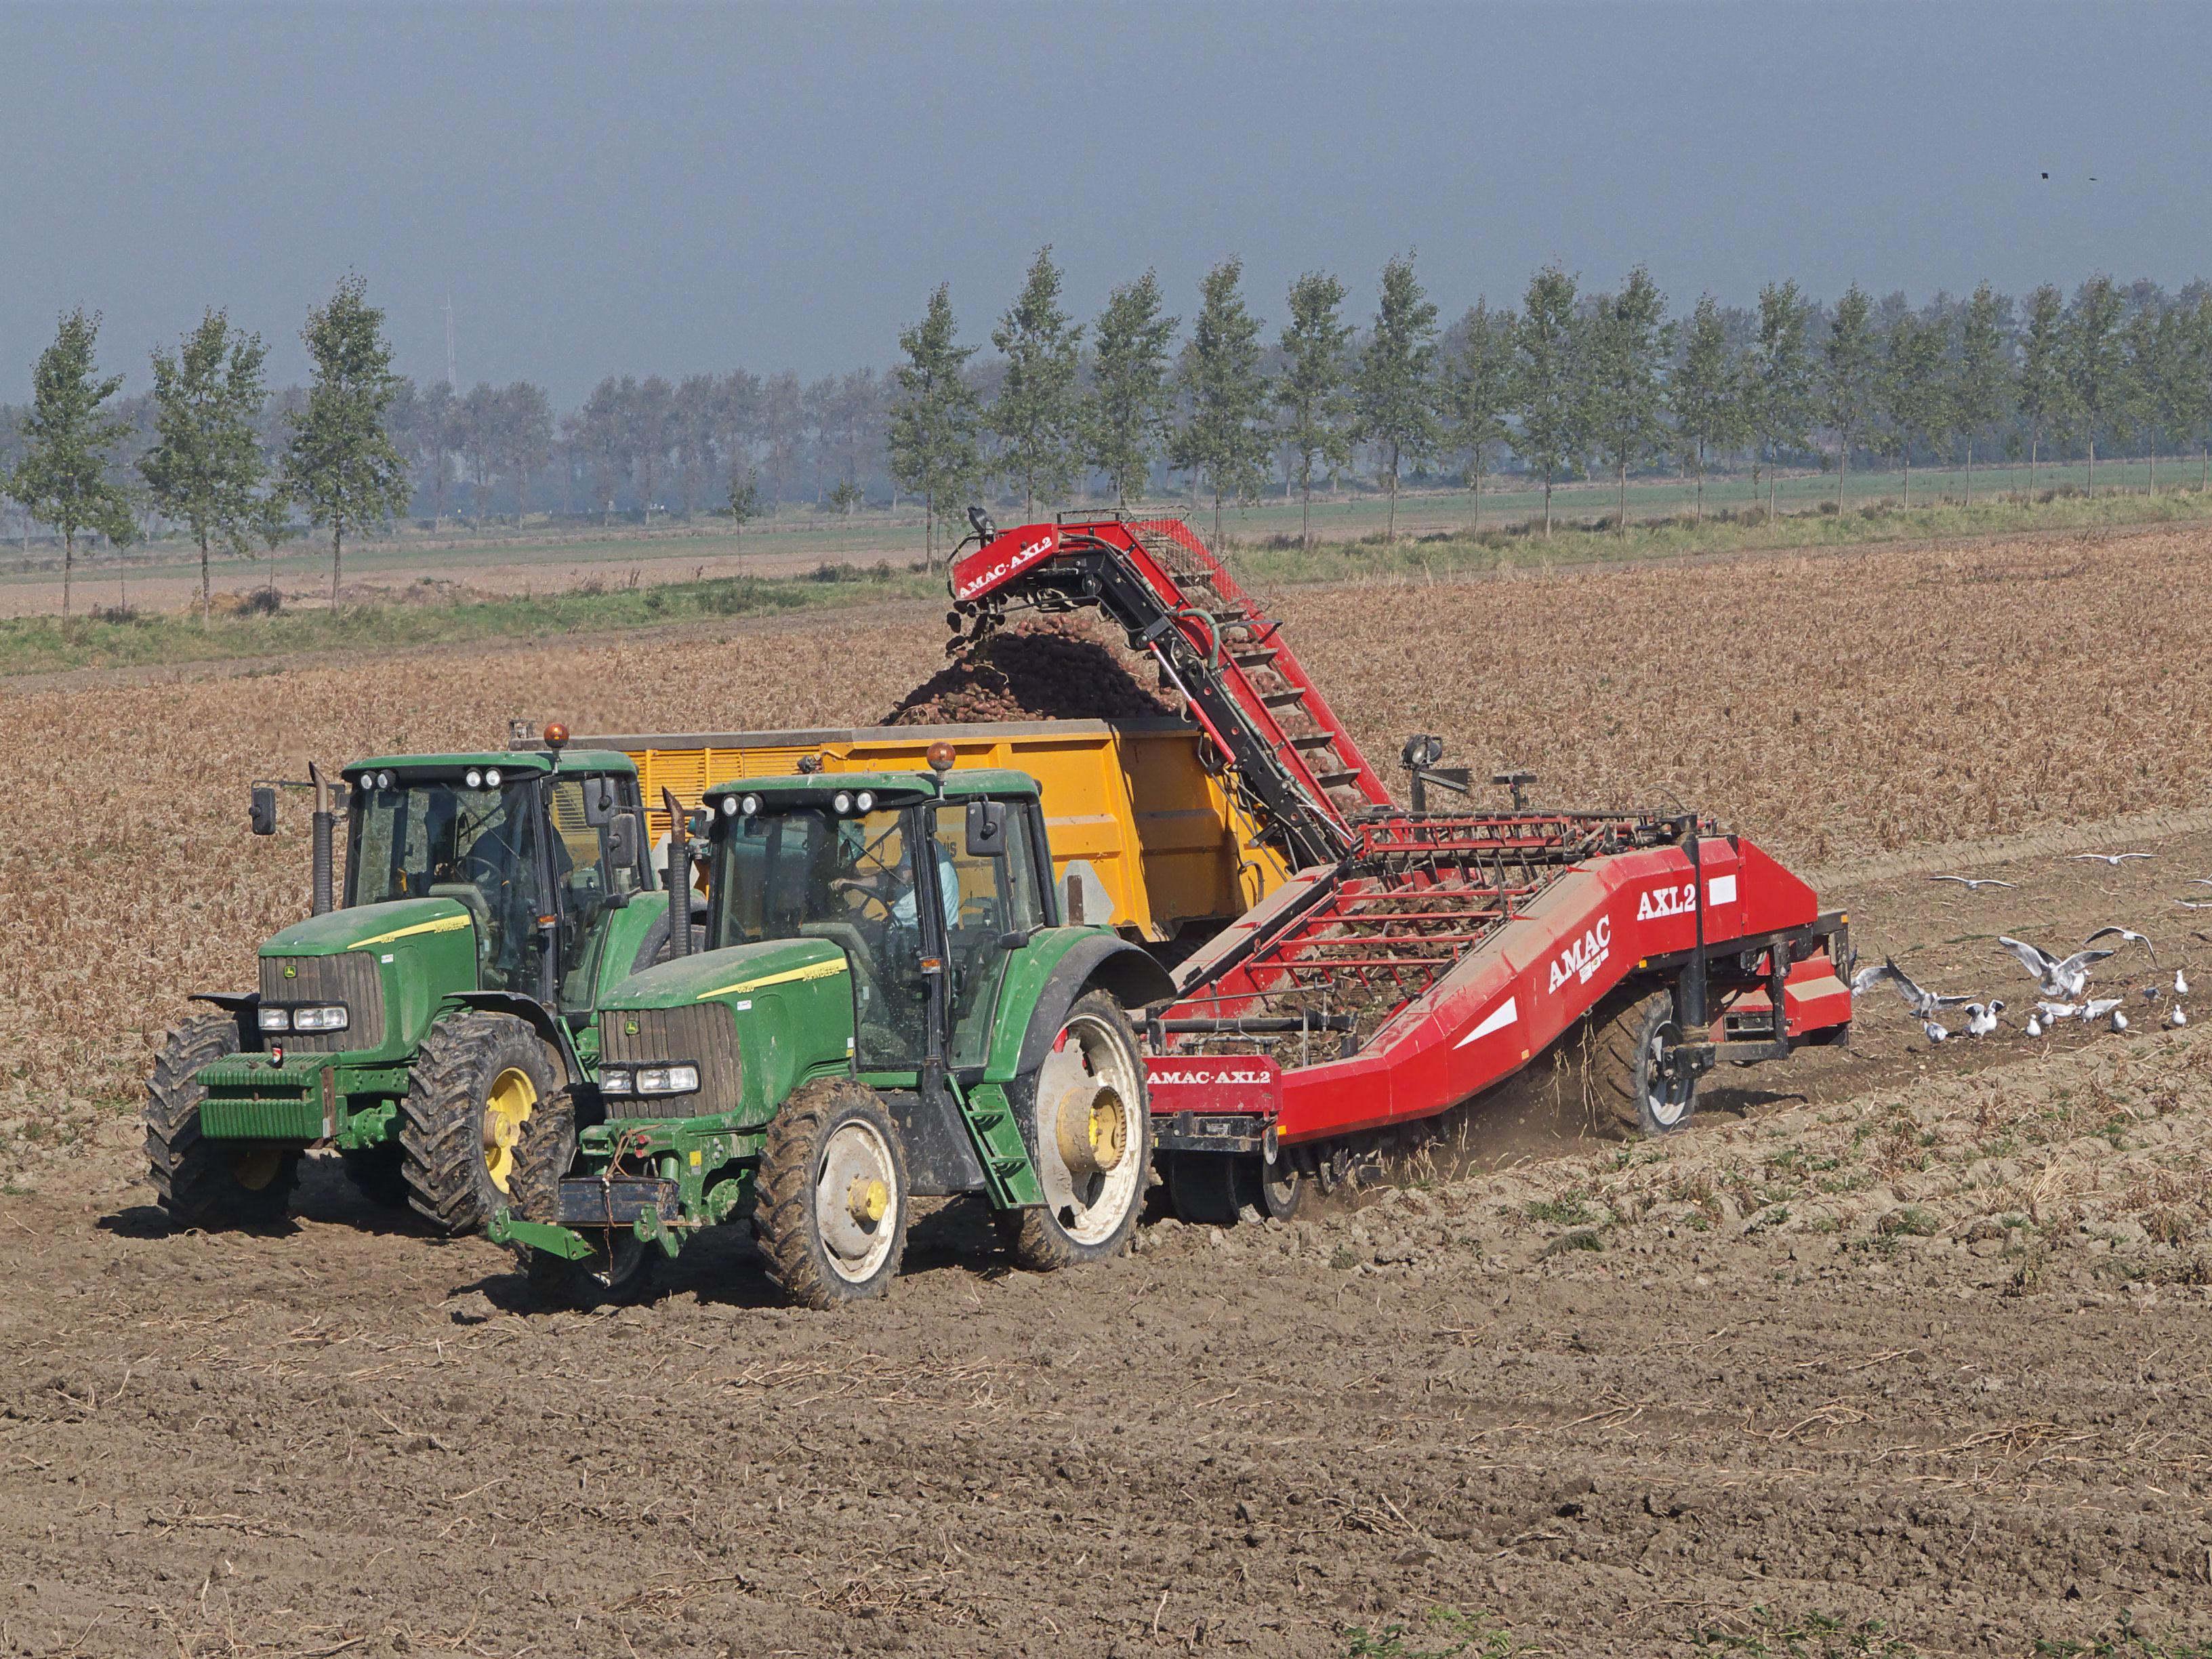 Bestand:Potato harvester, aardappelrooier.jpg